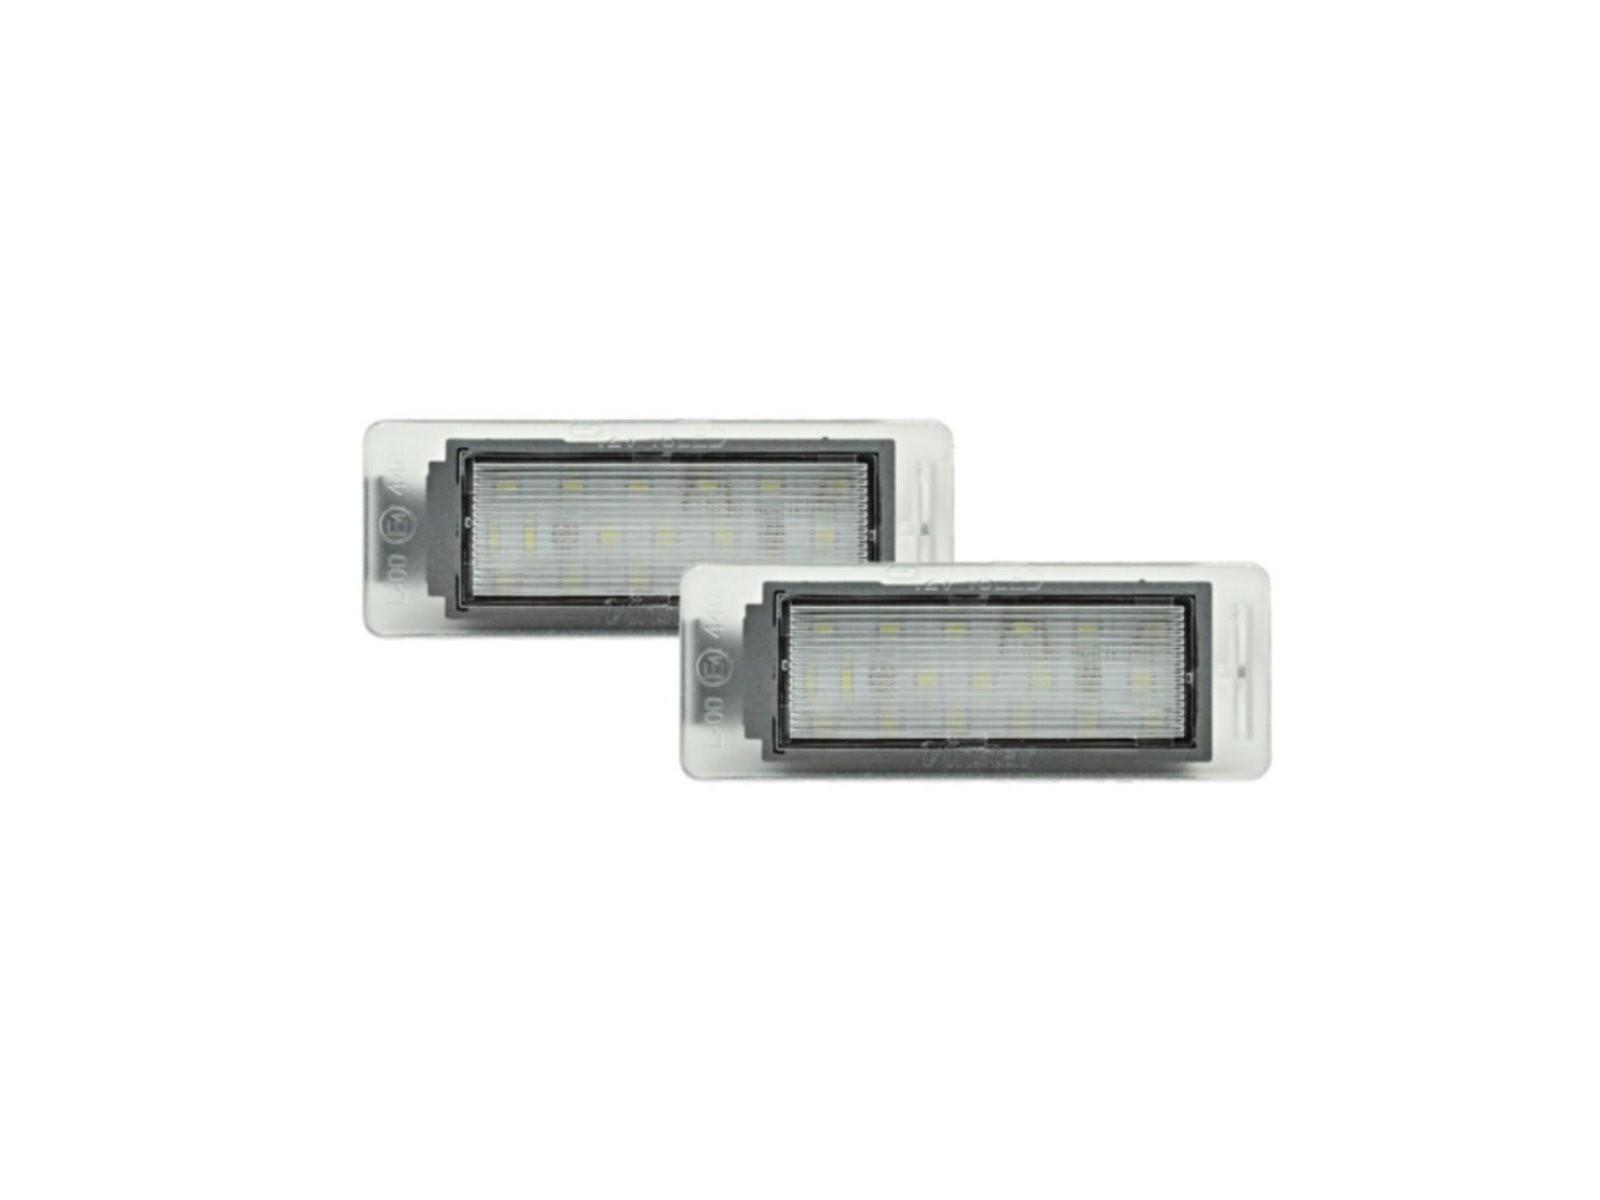 CrazyTheGod CTS 2013-2014 Sedan 4D LED W/ Canbus License Lamp White for CADILLAC